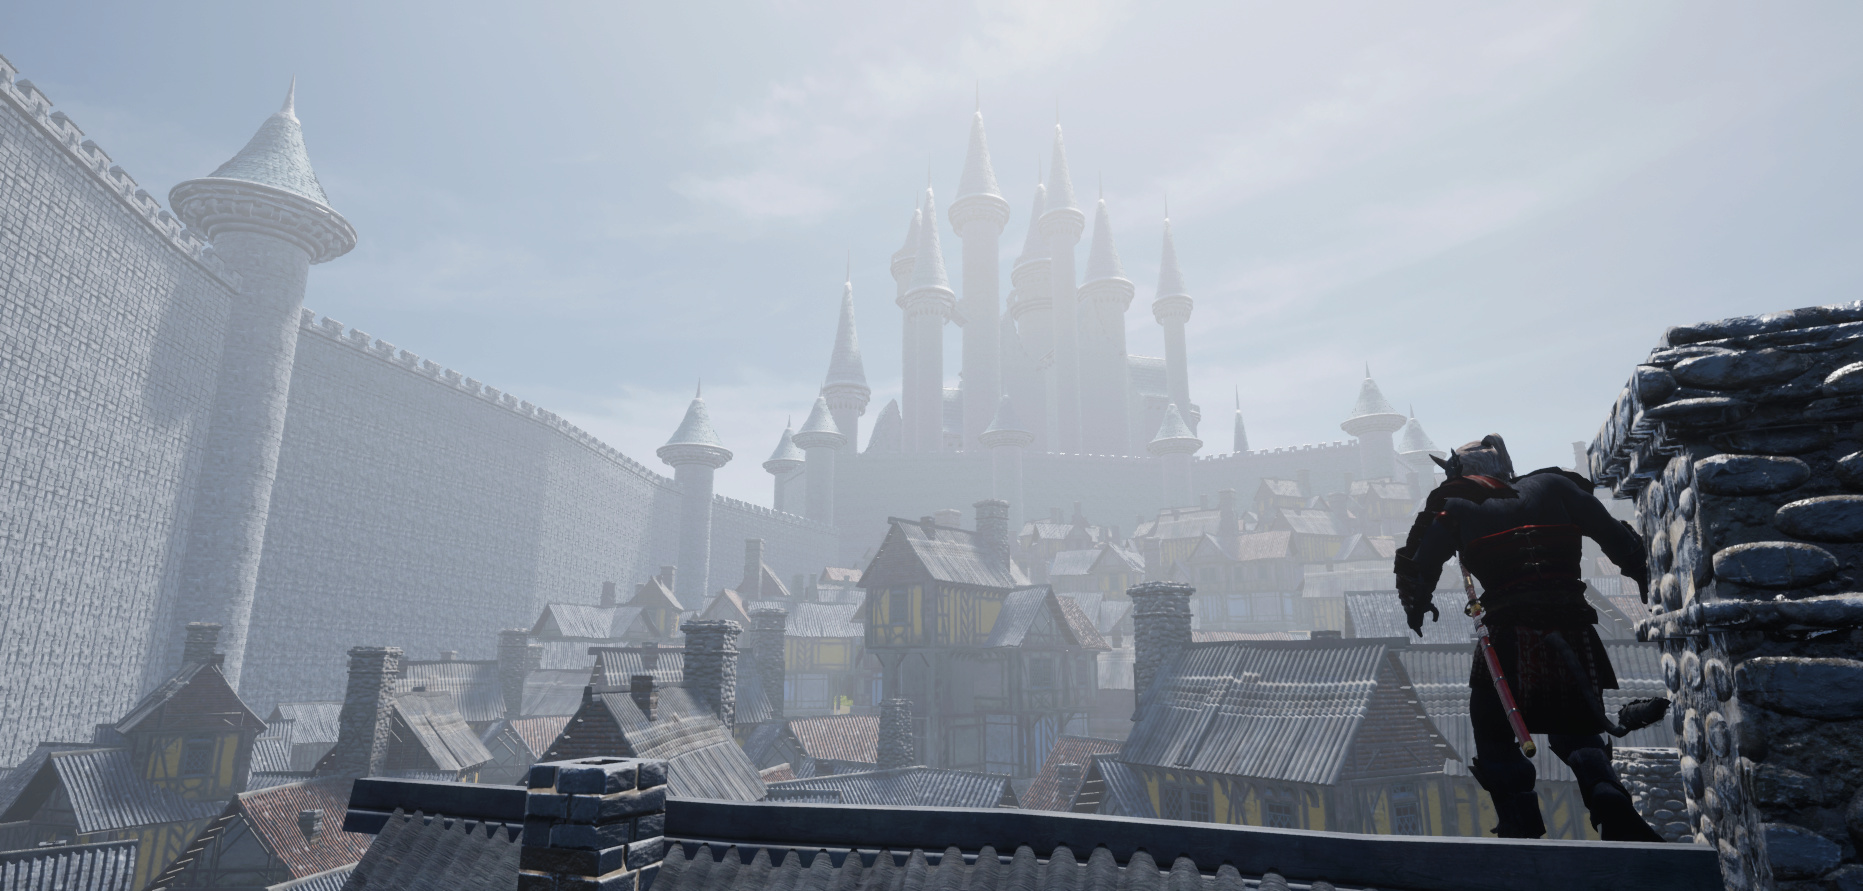 Sanctum : Le jeu vidéo & Projet Kanak Citade10